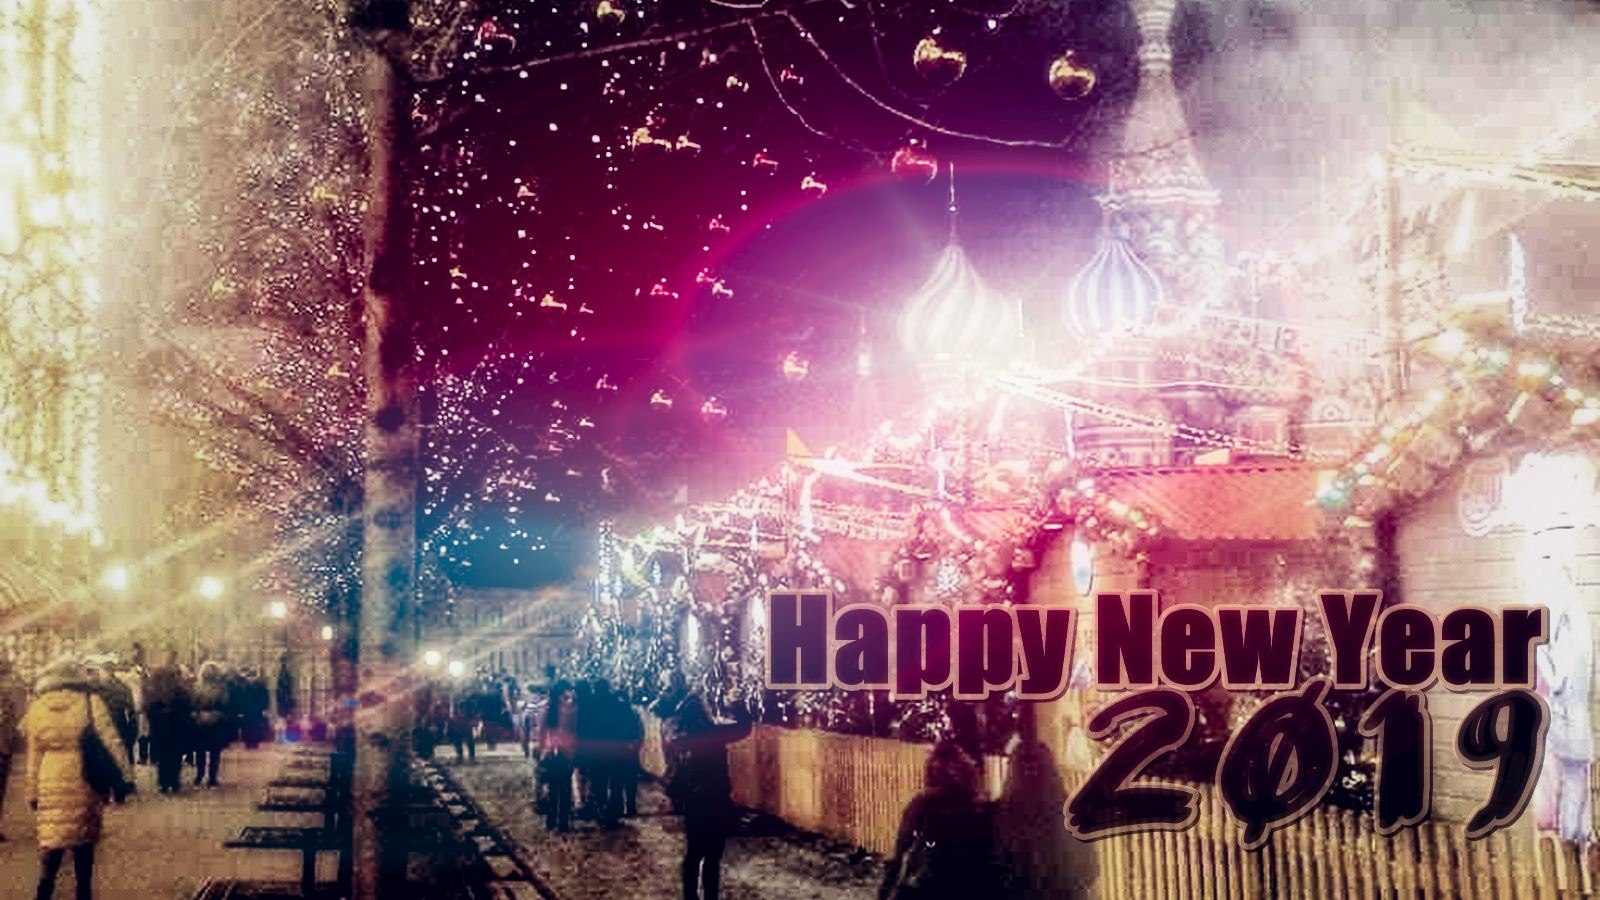 Happy New Year 2019 Hd Image Picture Biz Wallpaper